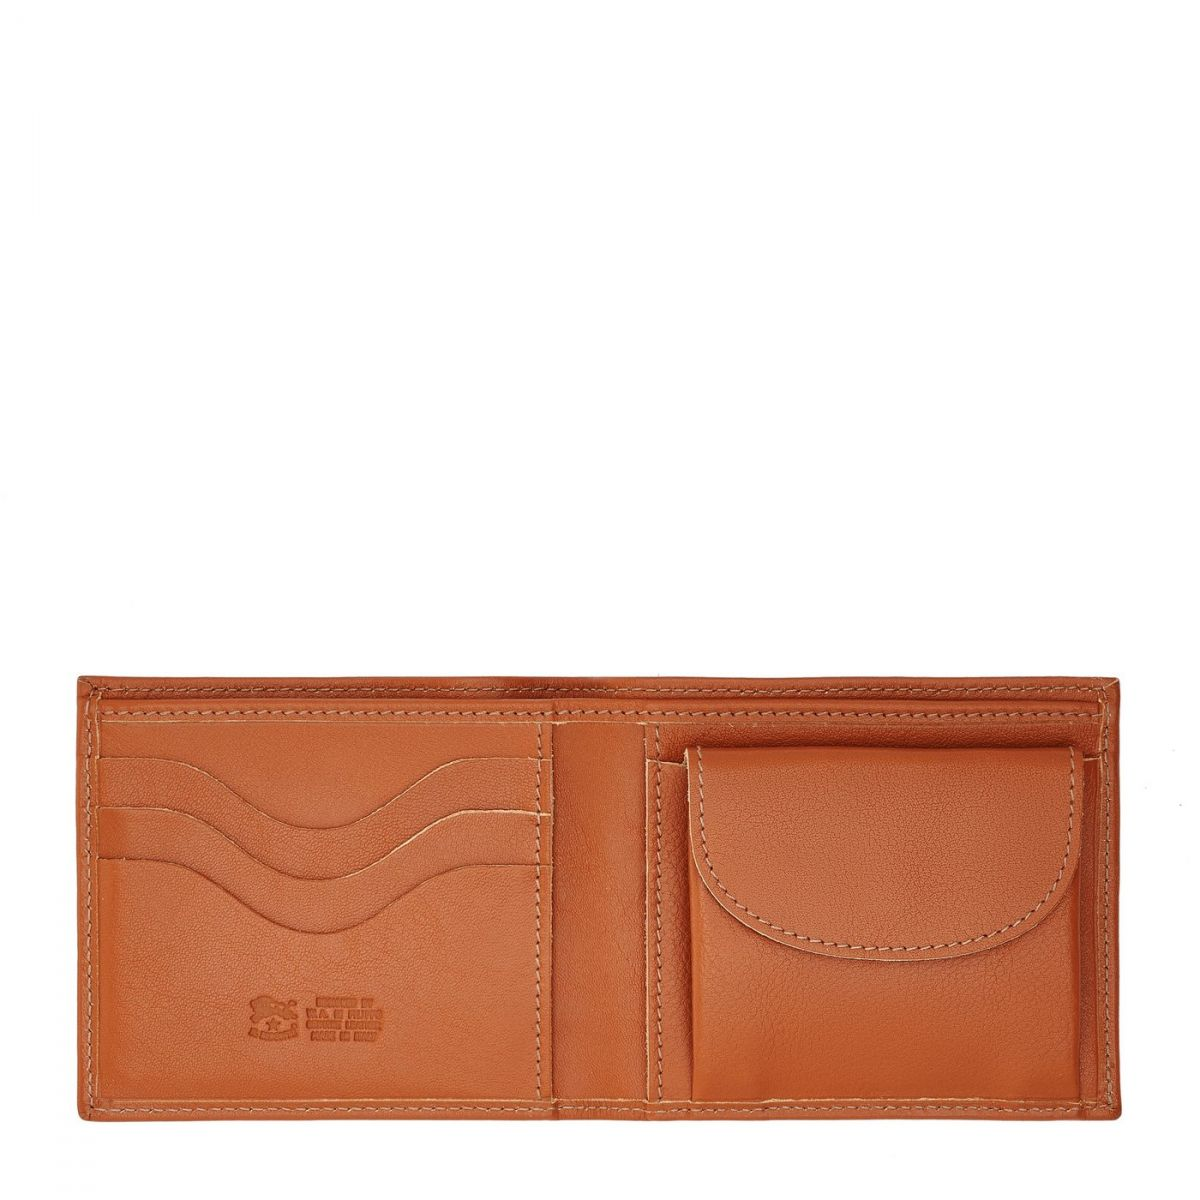 Men's Bi-Fold Wallet  in Cowhide Double Leather SBW007 color Caramel | Details